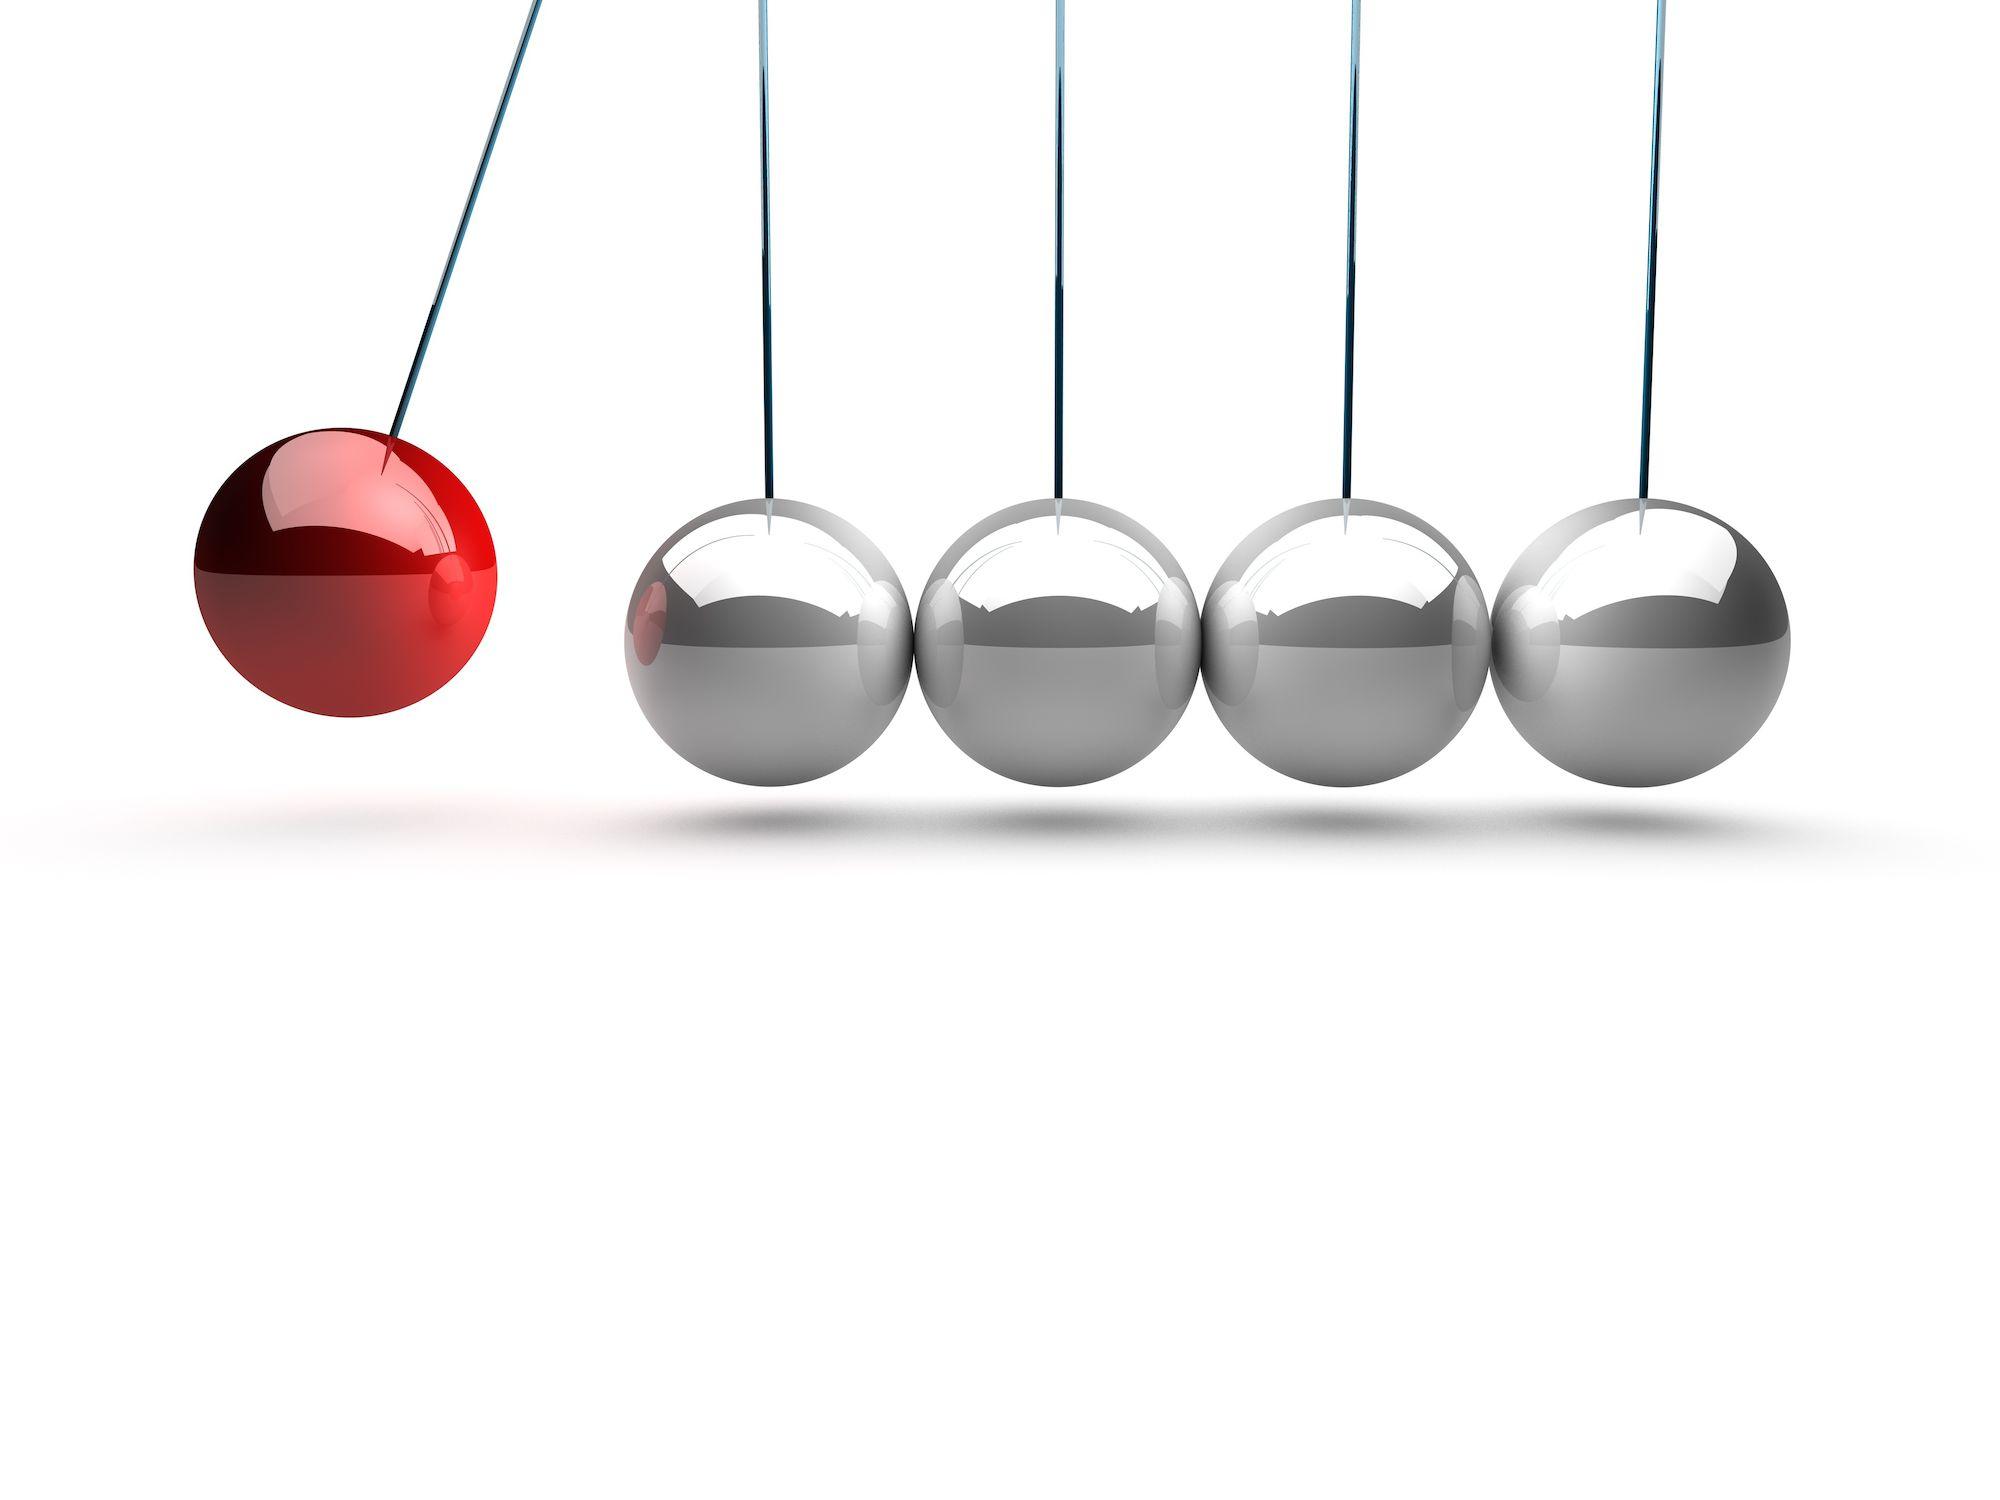 Newton's balance balls